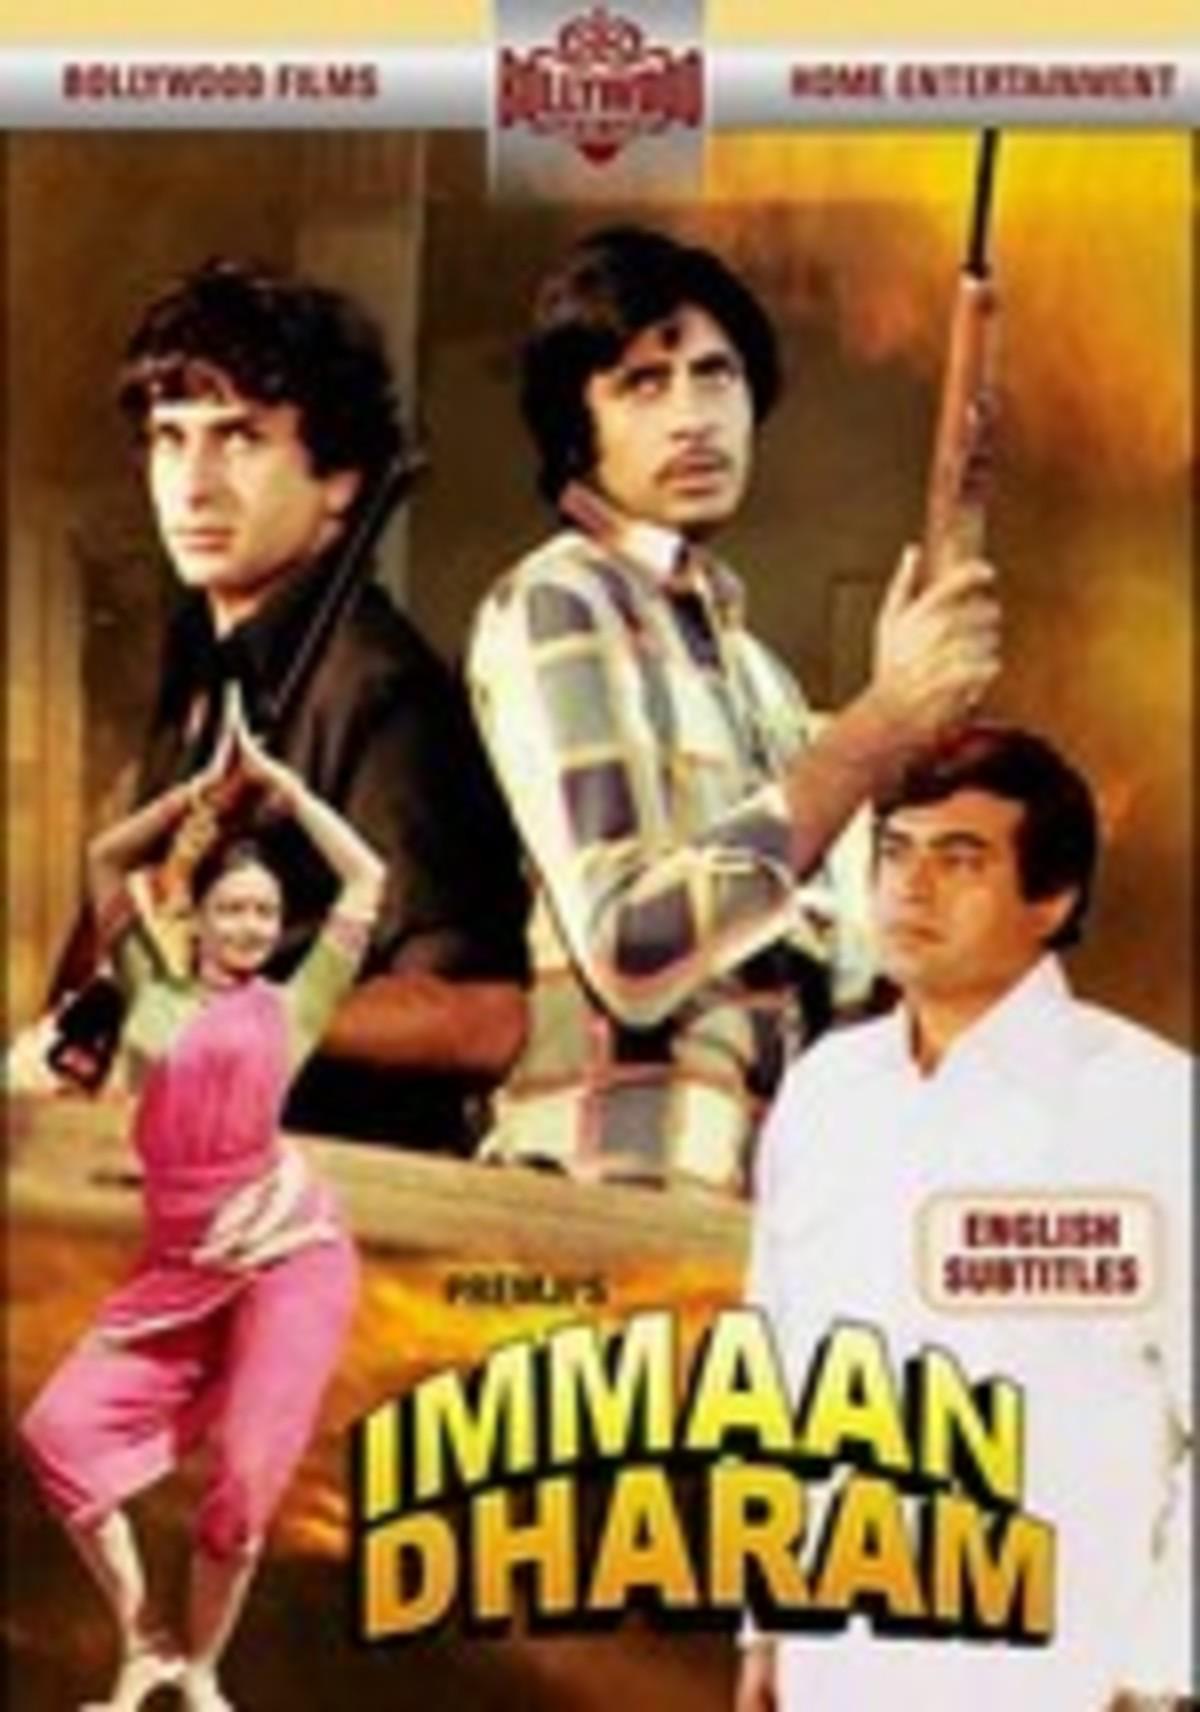 Poster of Amitabh Bachchan starrer Immaan Dharam